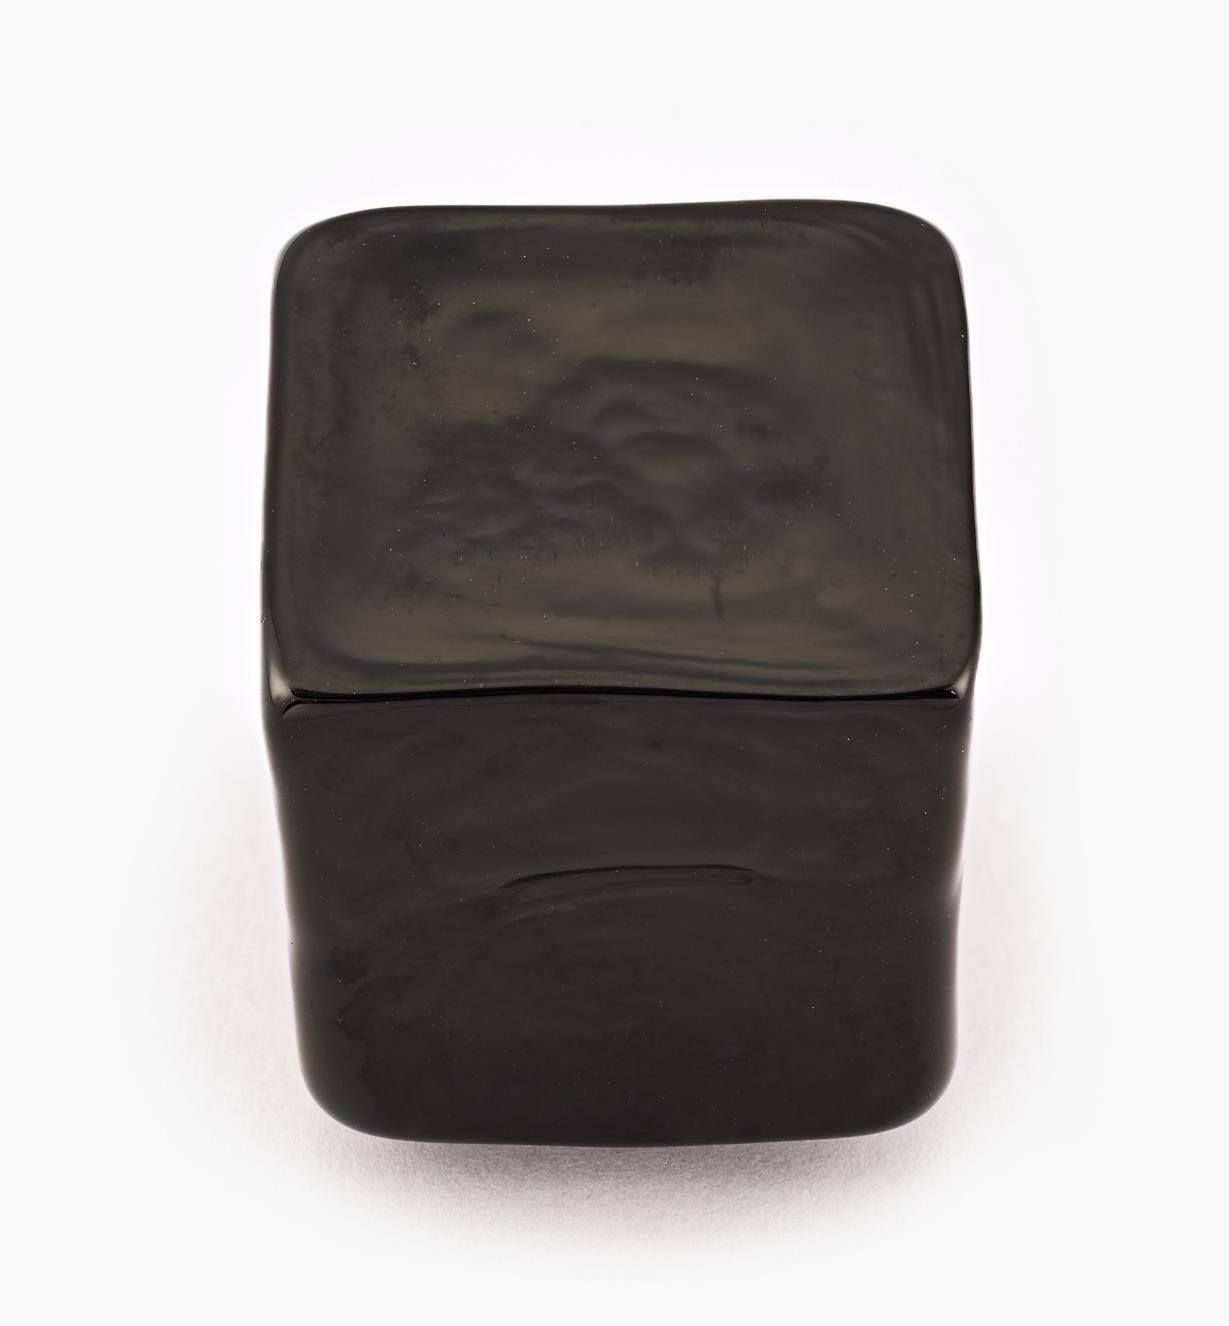 00A7702 - Murano Venezia Knob, Black